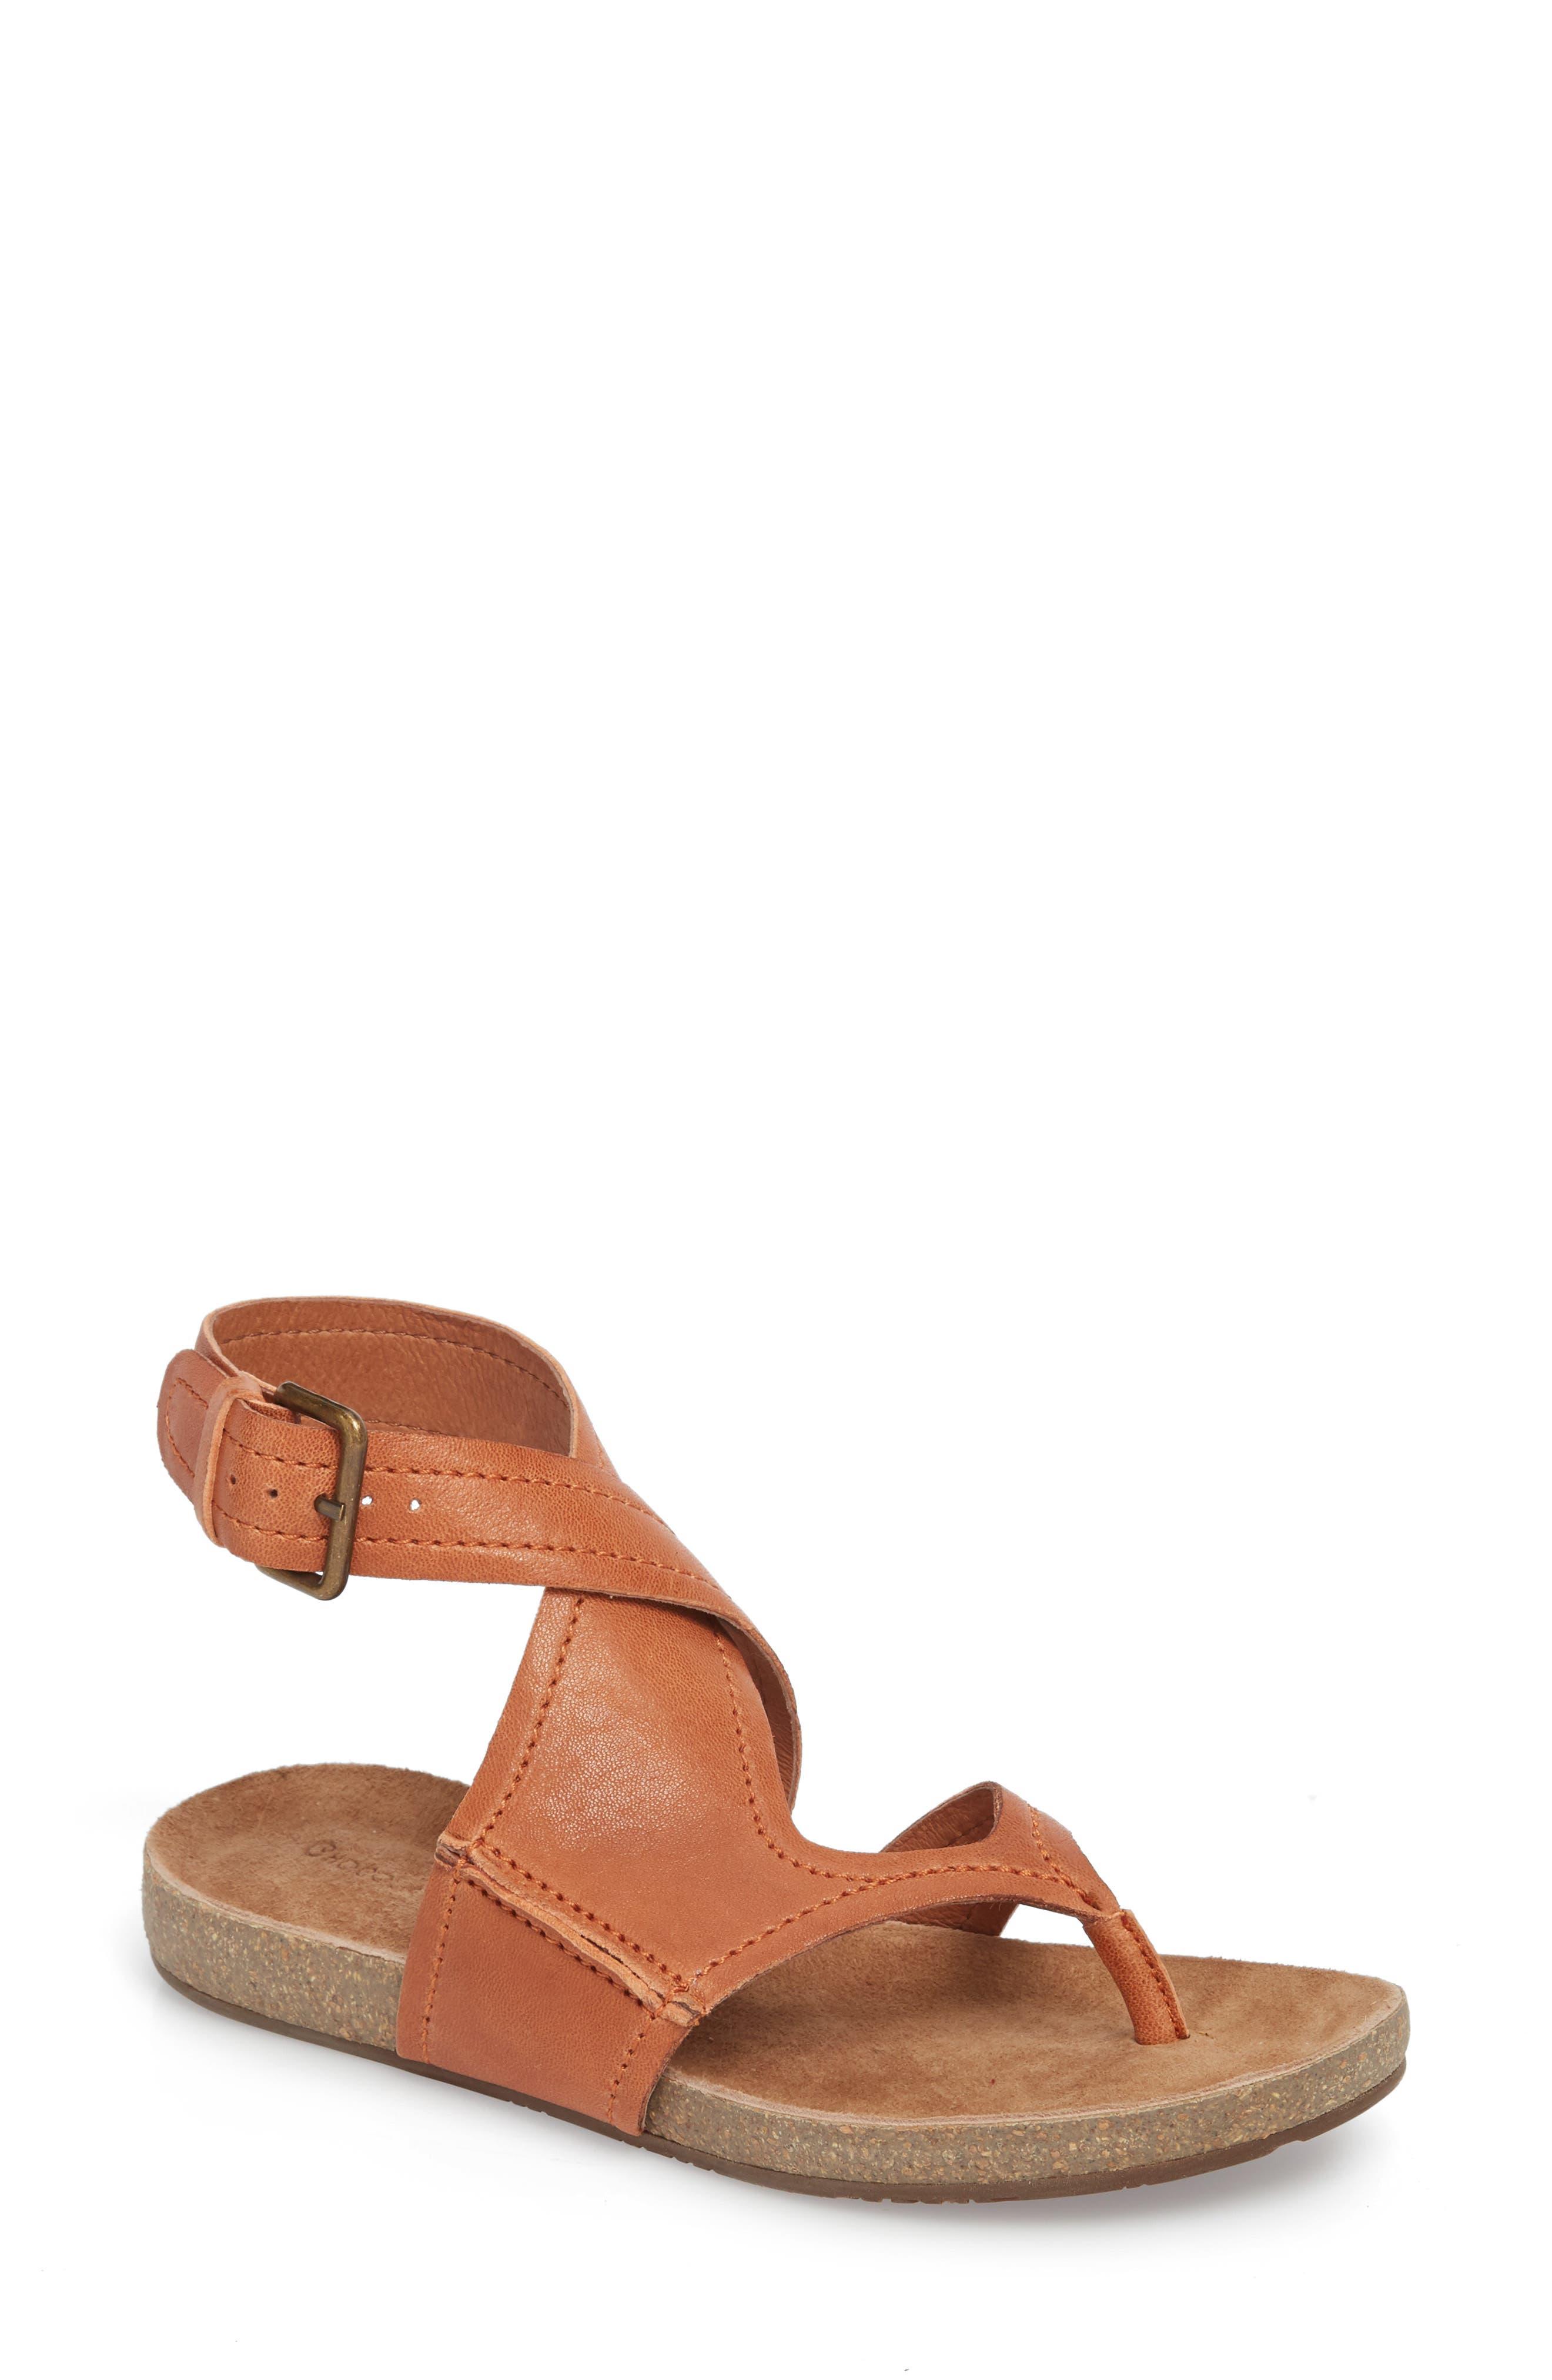 Yagger Sandal,                         Main,                         color, Camel Leather